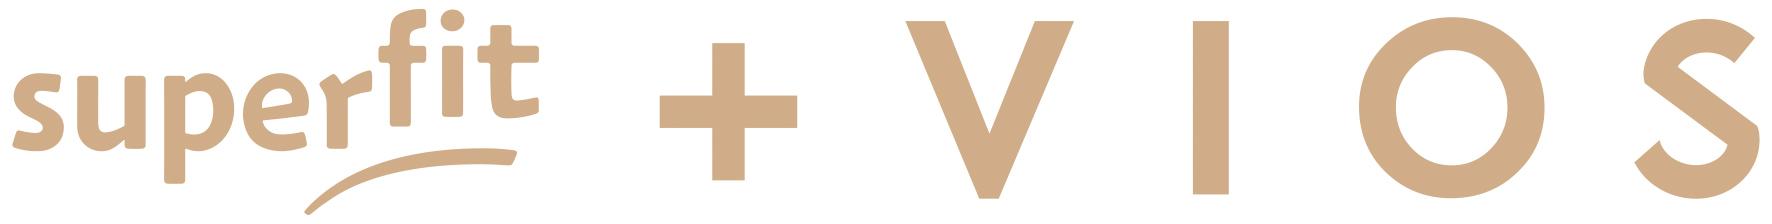 superfit-vios-logo